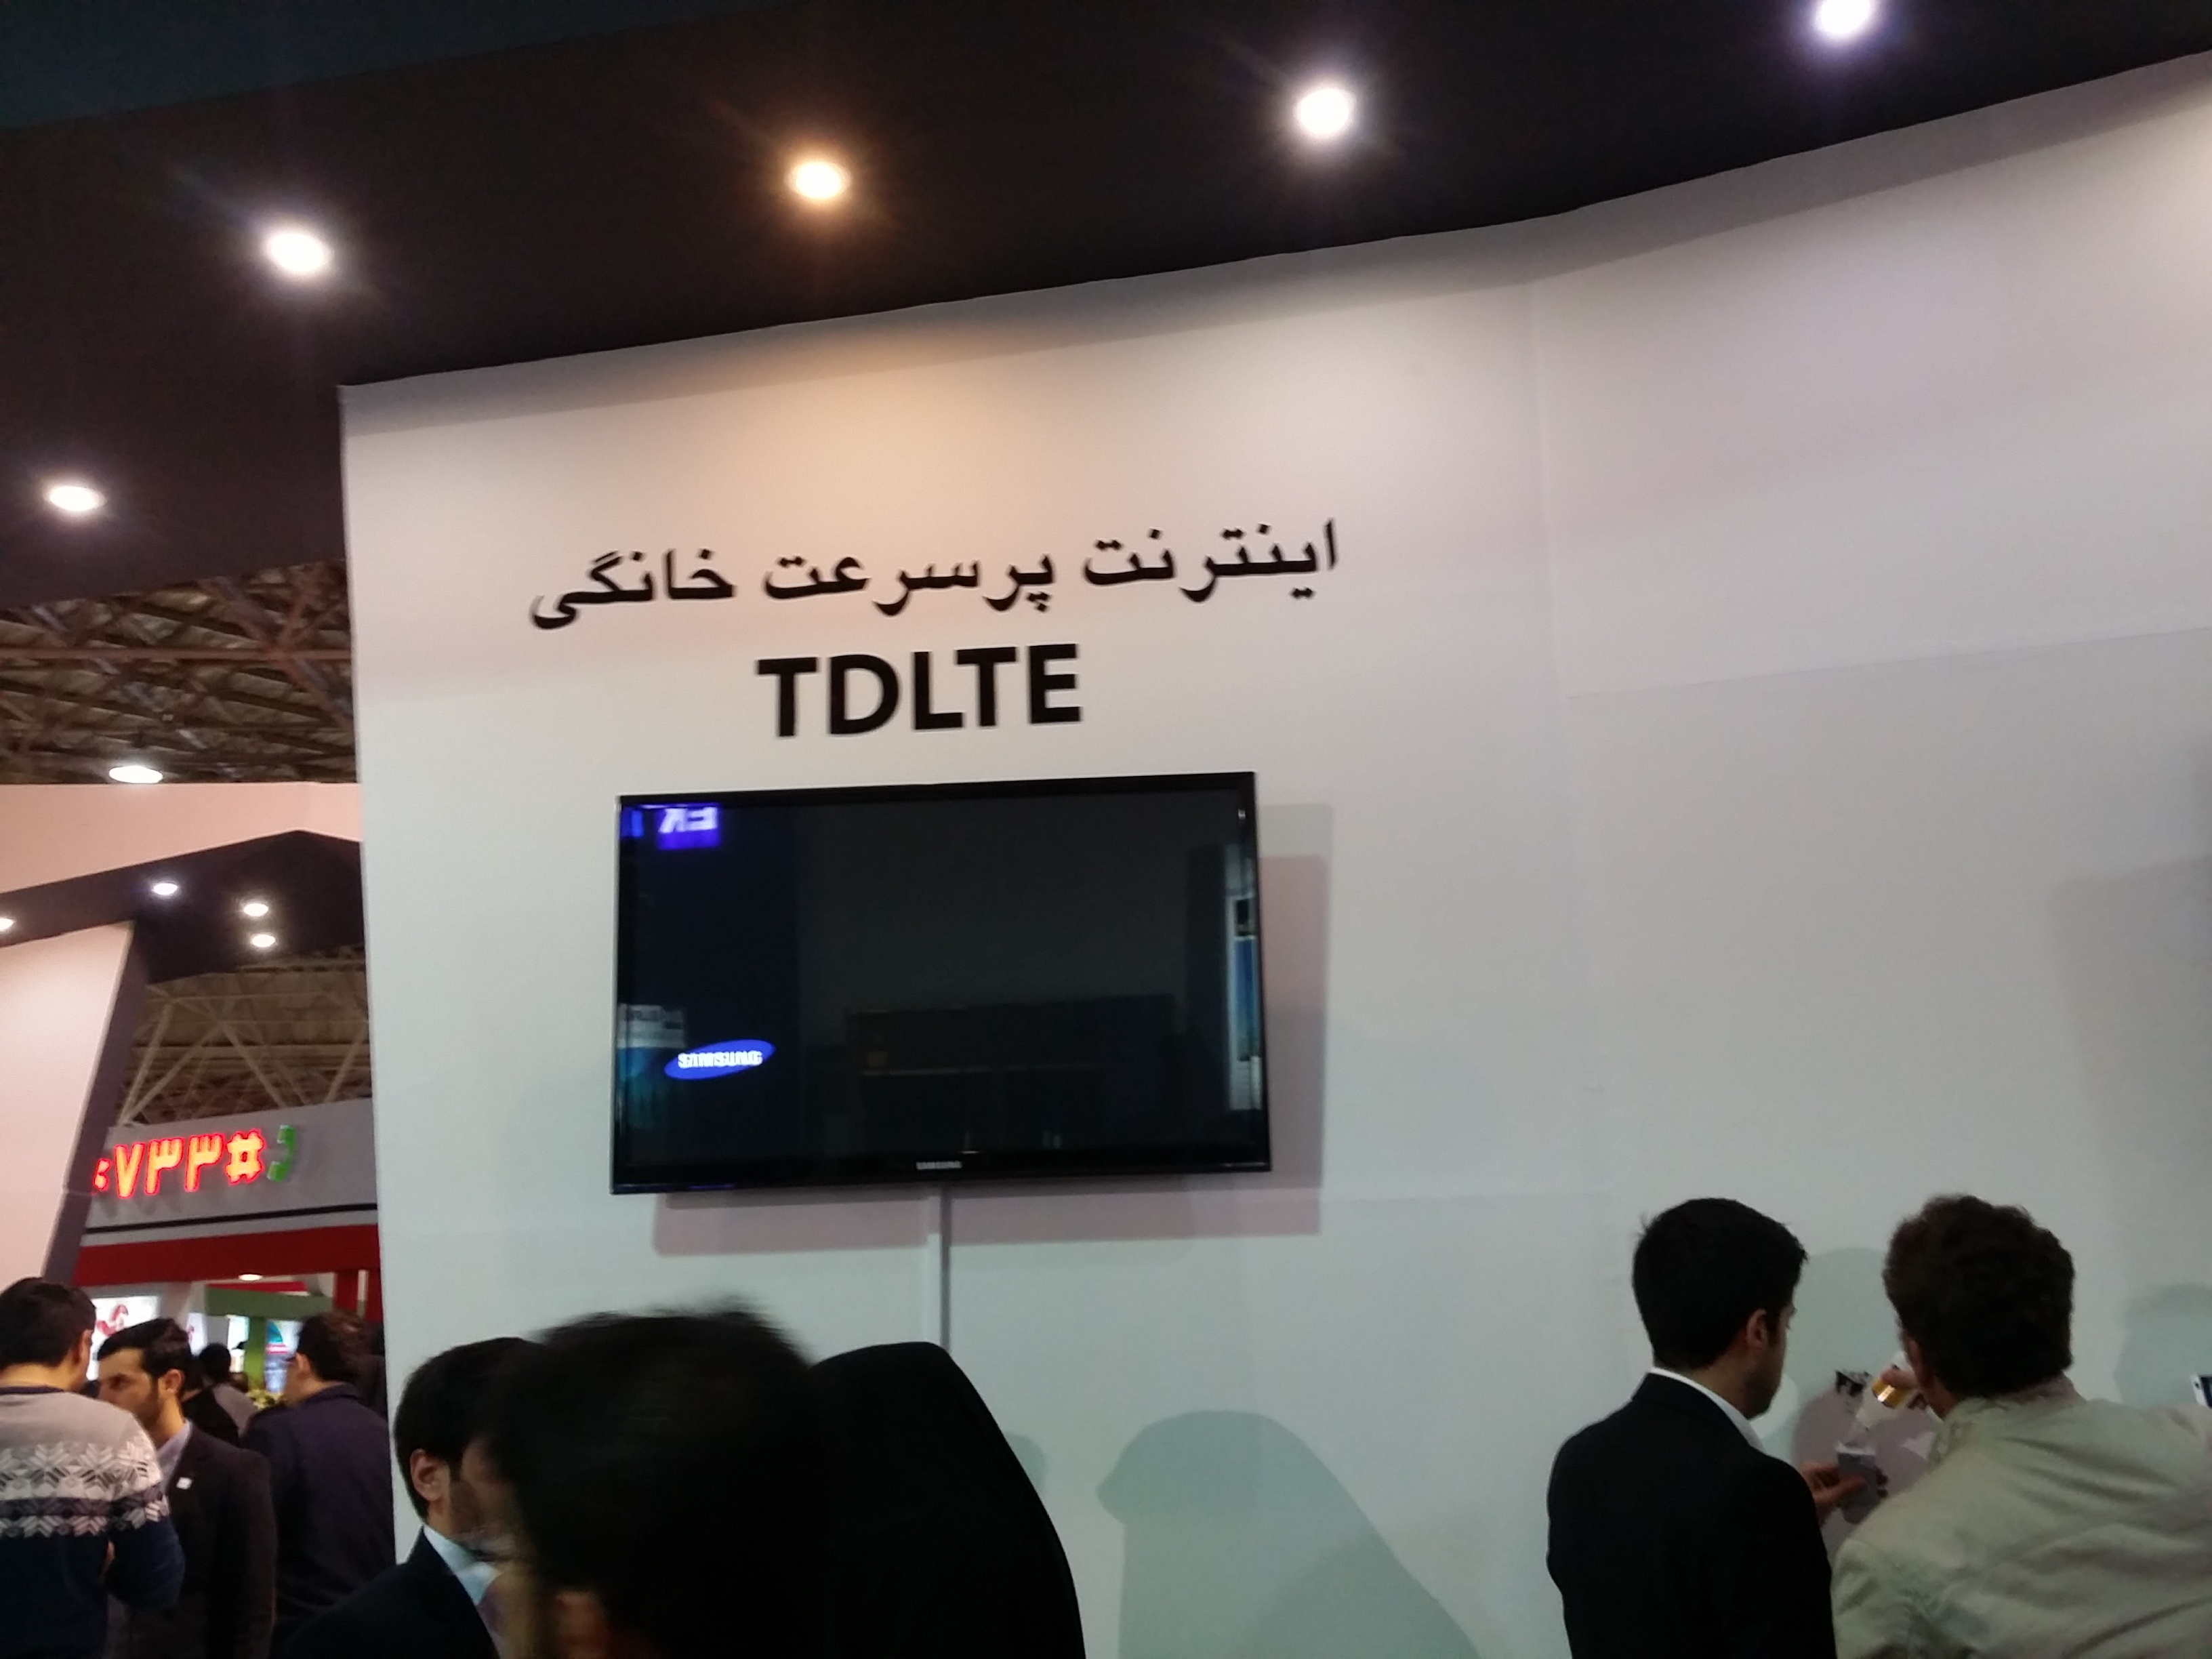 20151216_111856